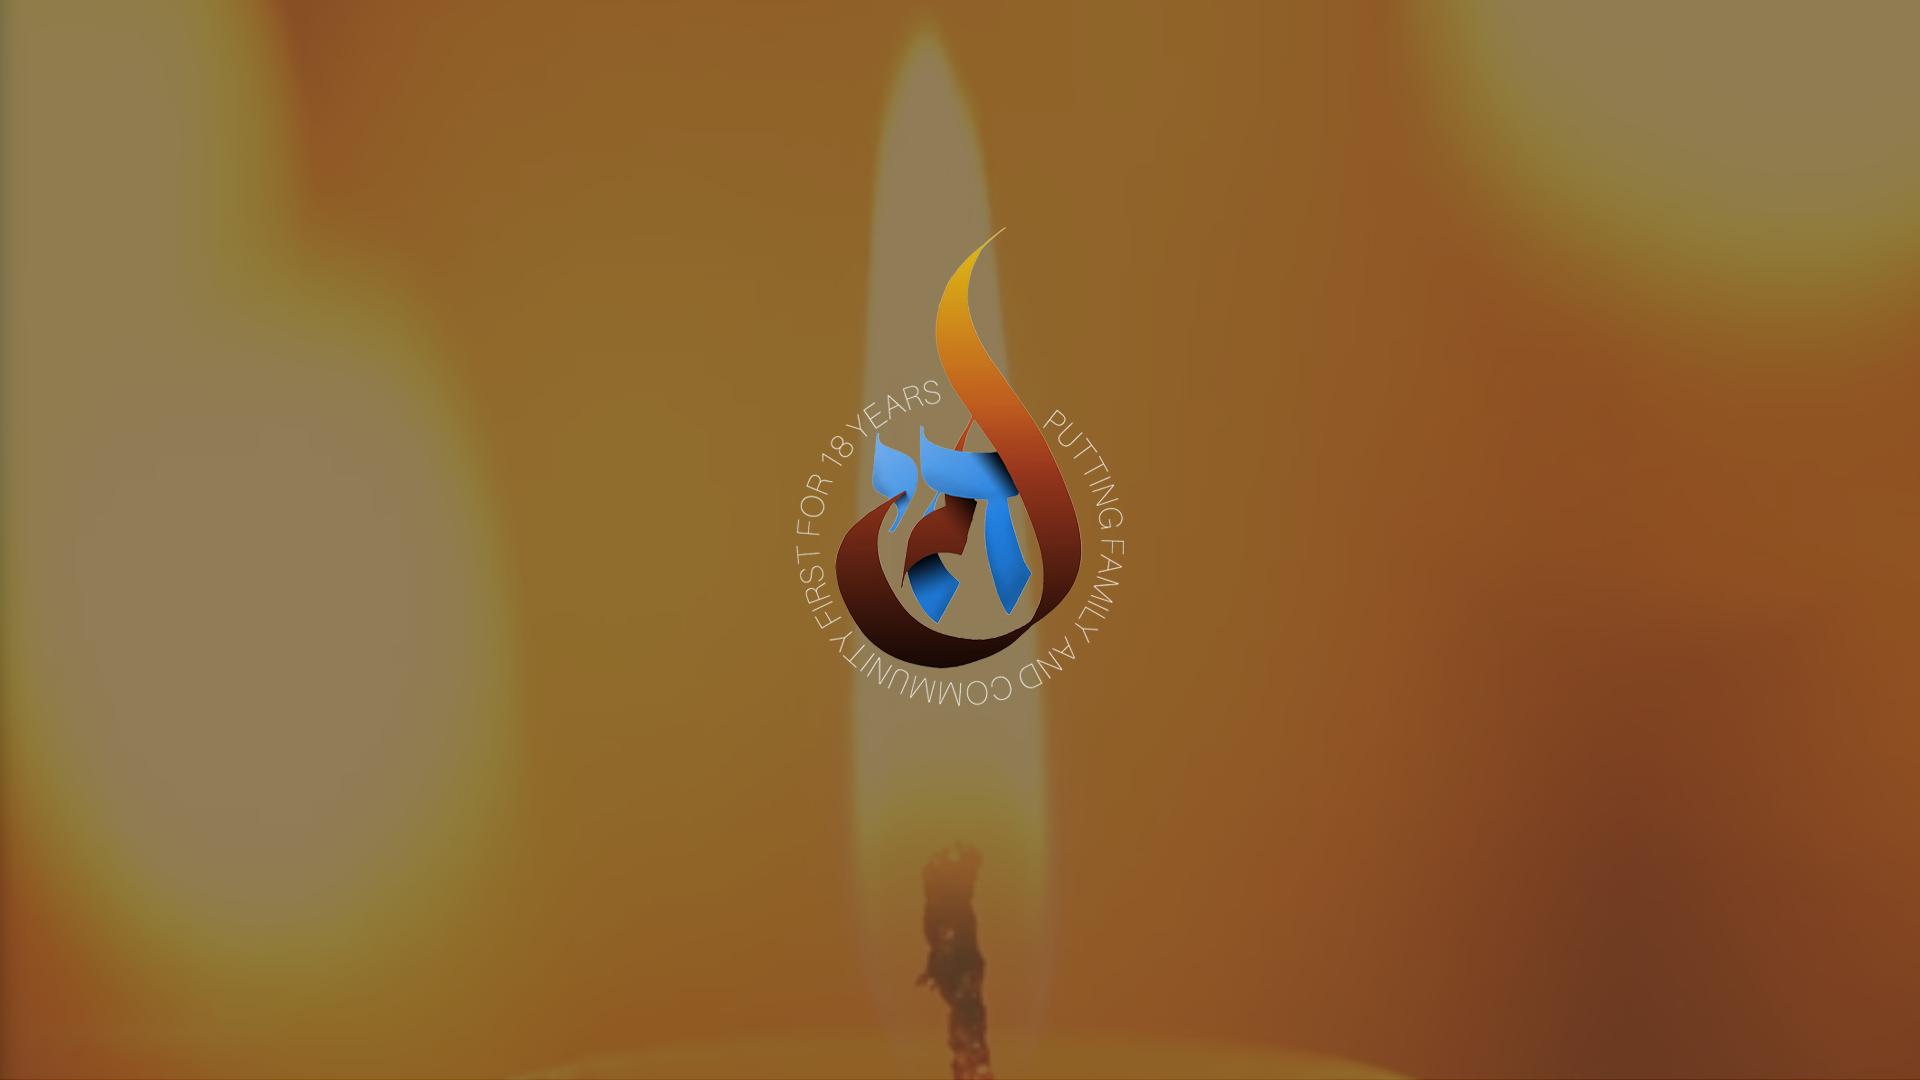 Flame Slide